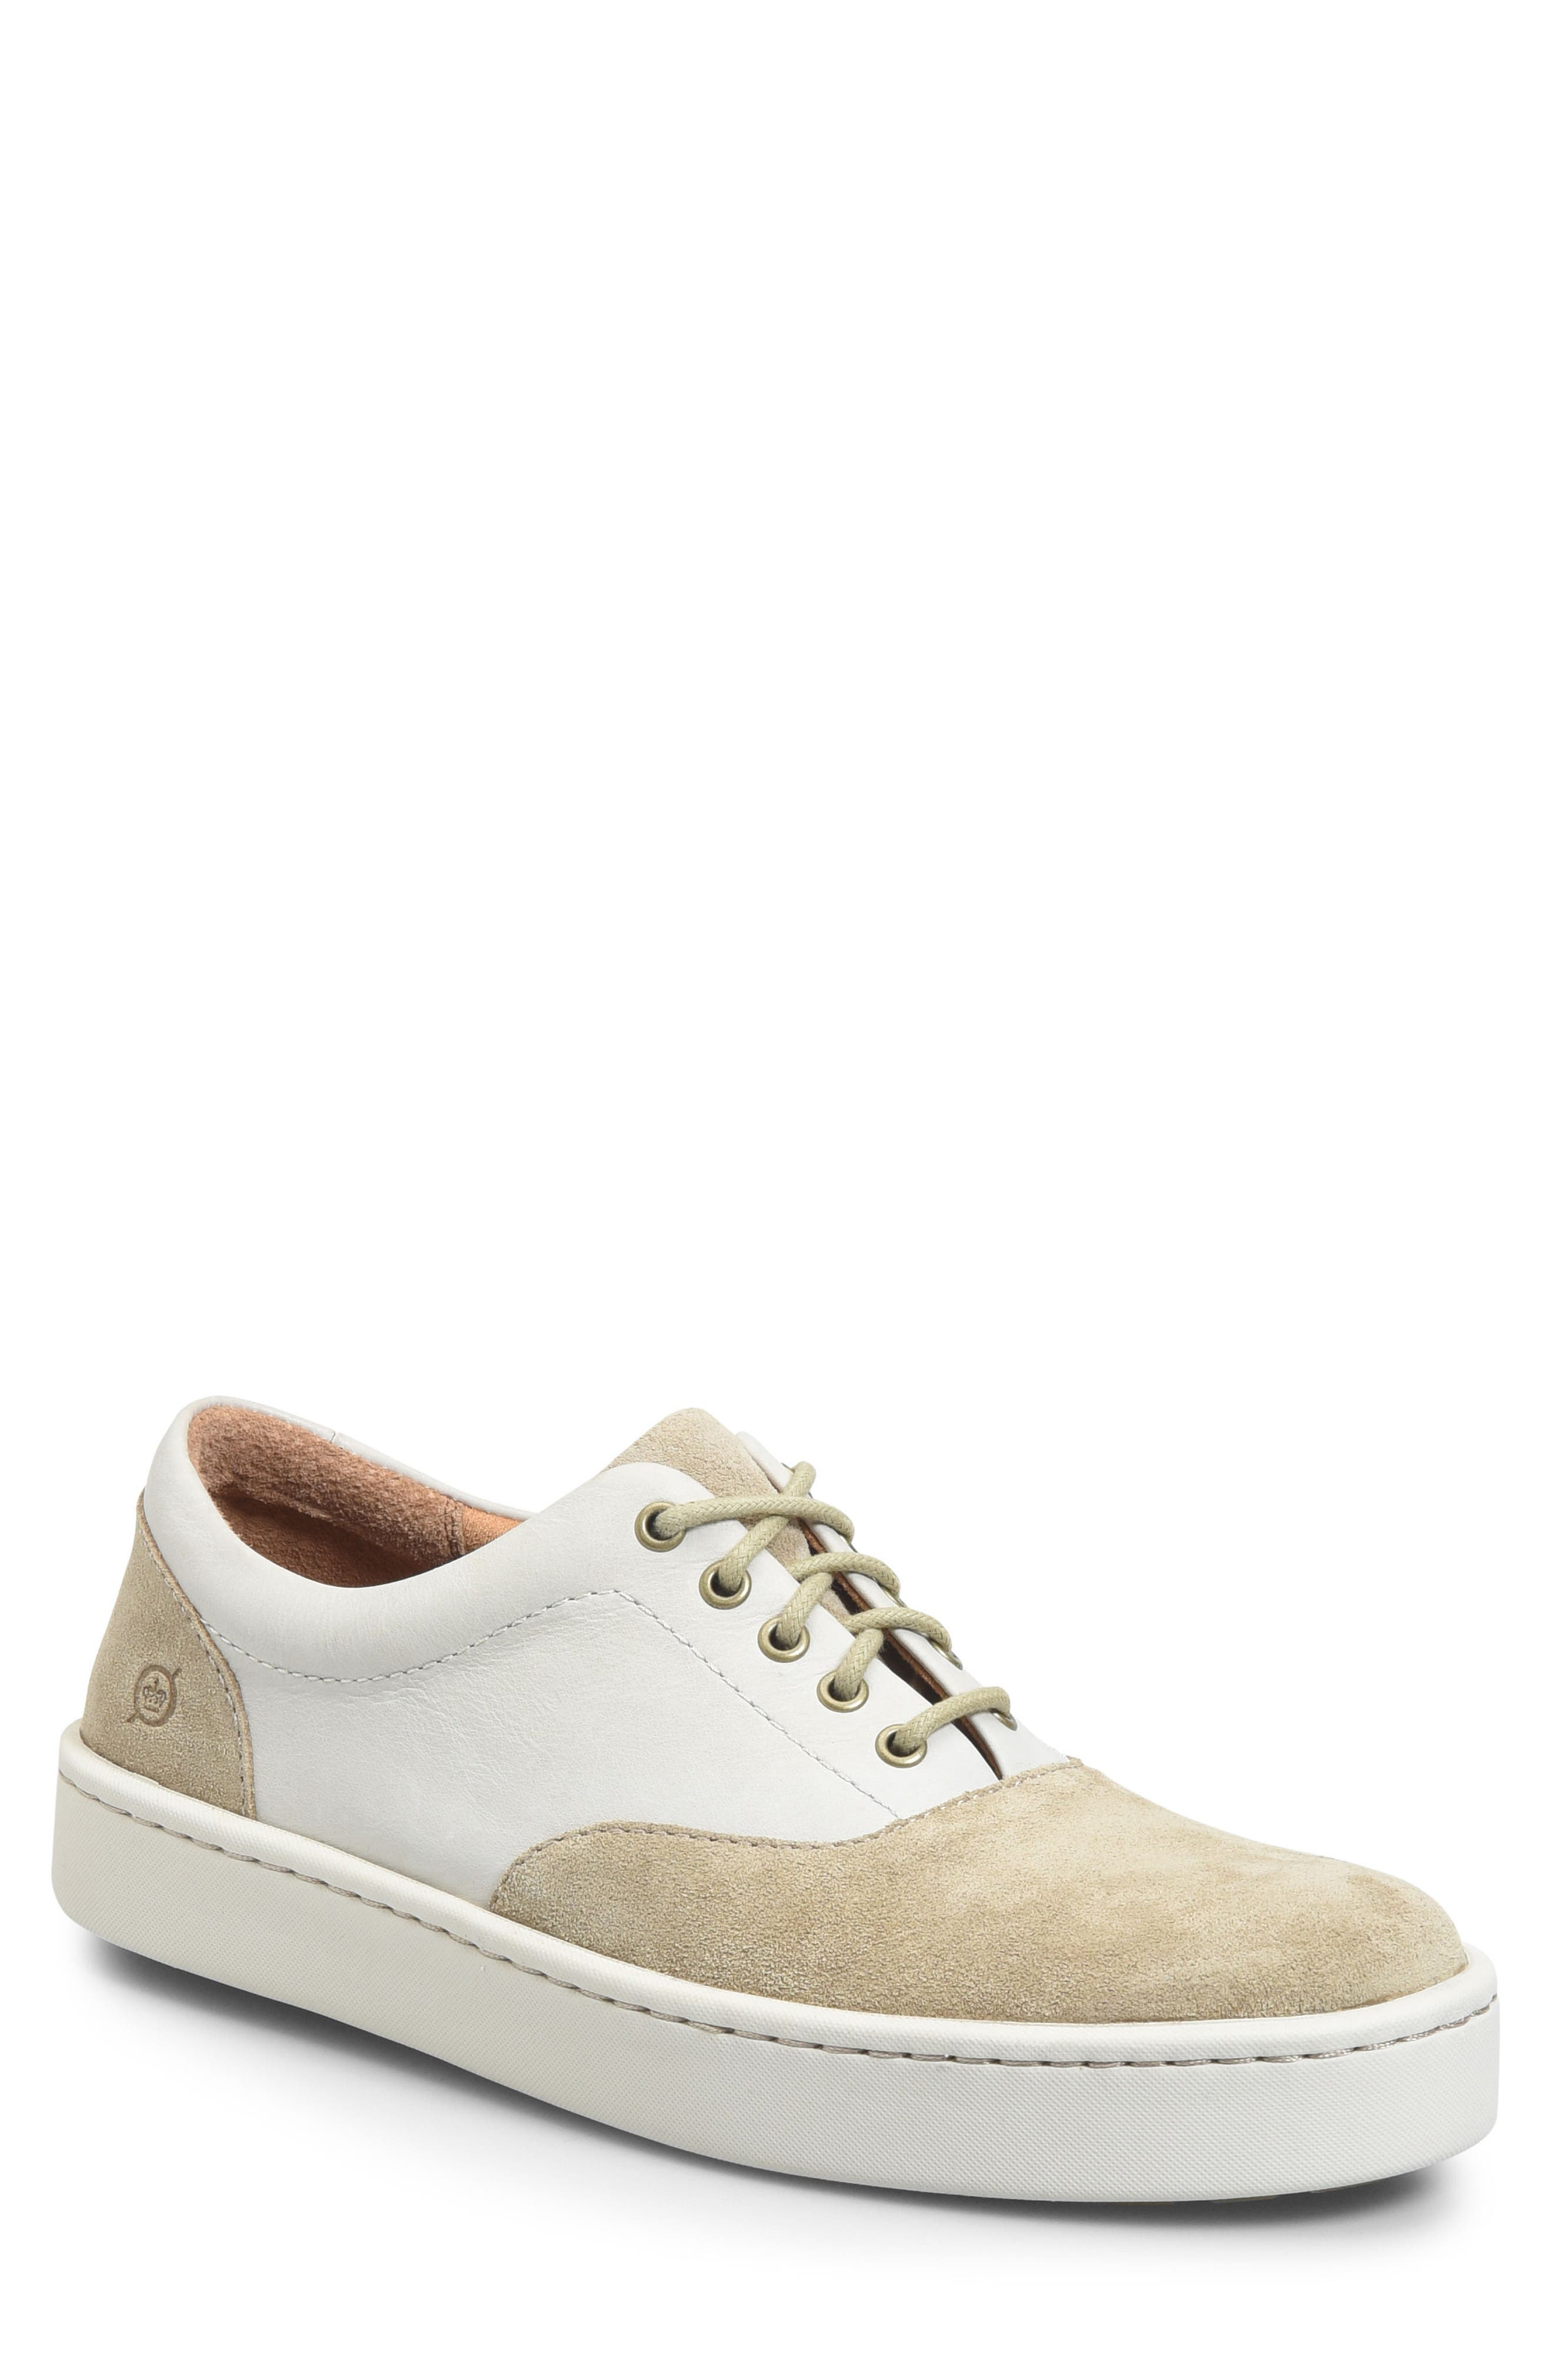 Keystone Low Top Sneaker,                             Main thumbnail 3, color,